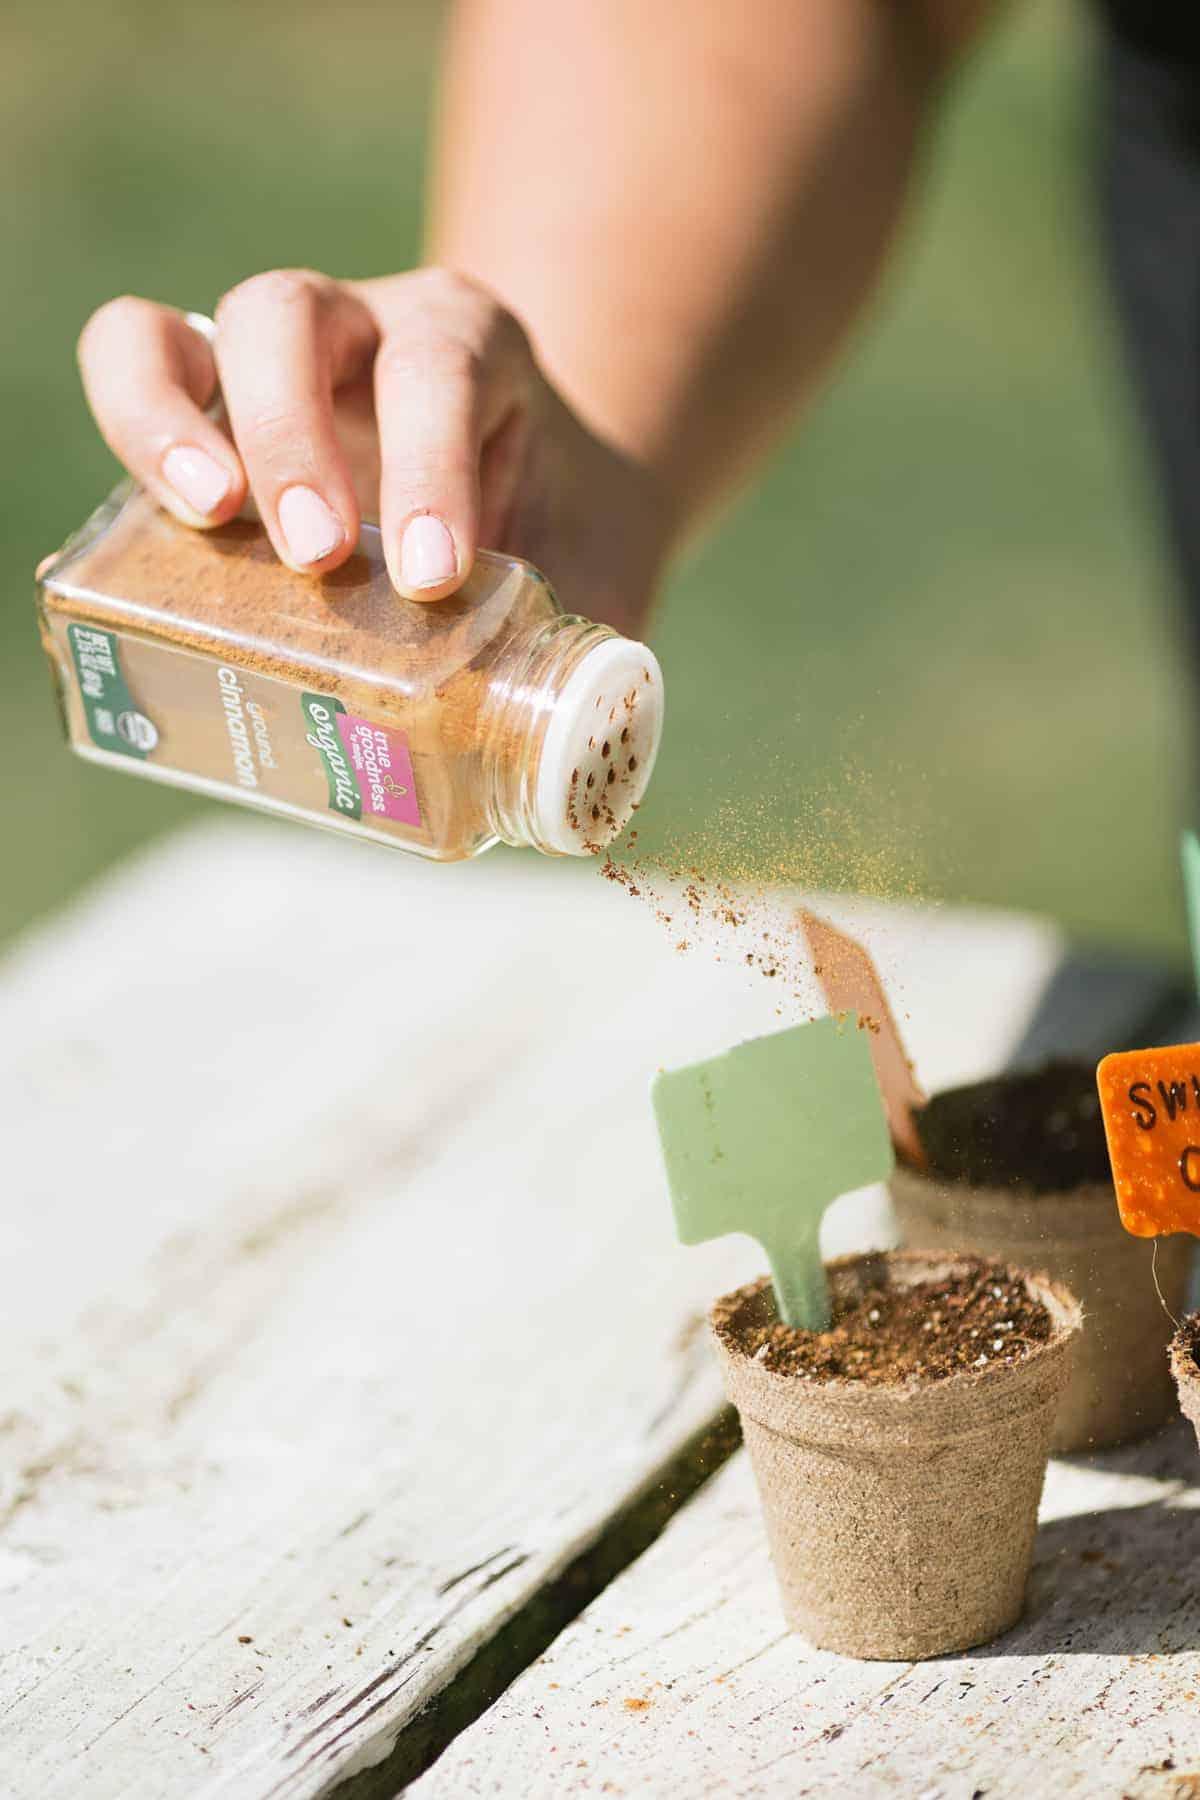 Hand sprinkling cinnamon over planted peat pots